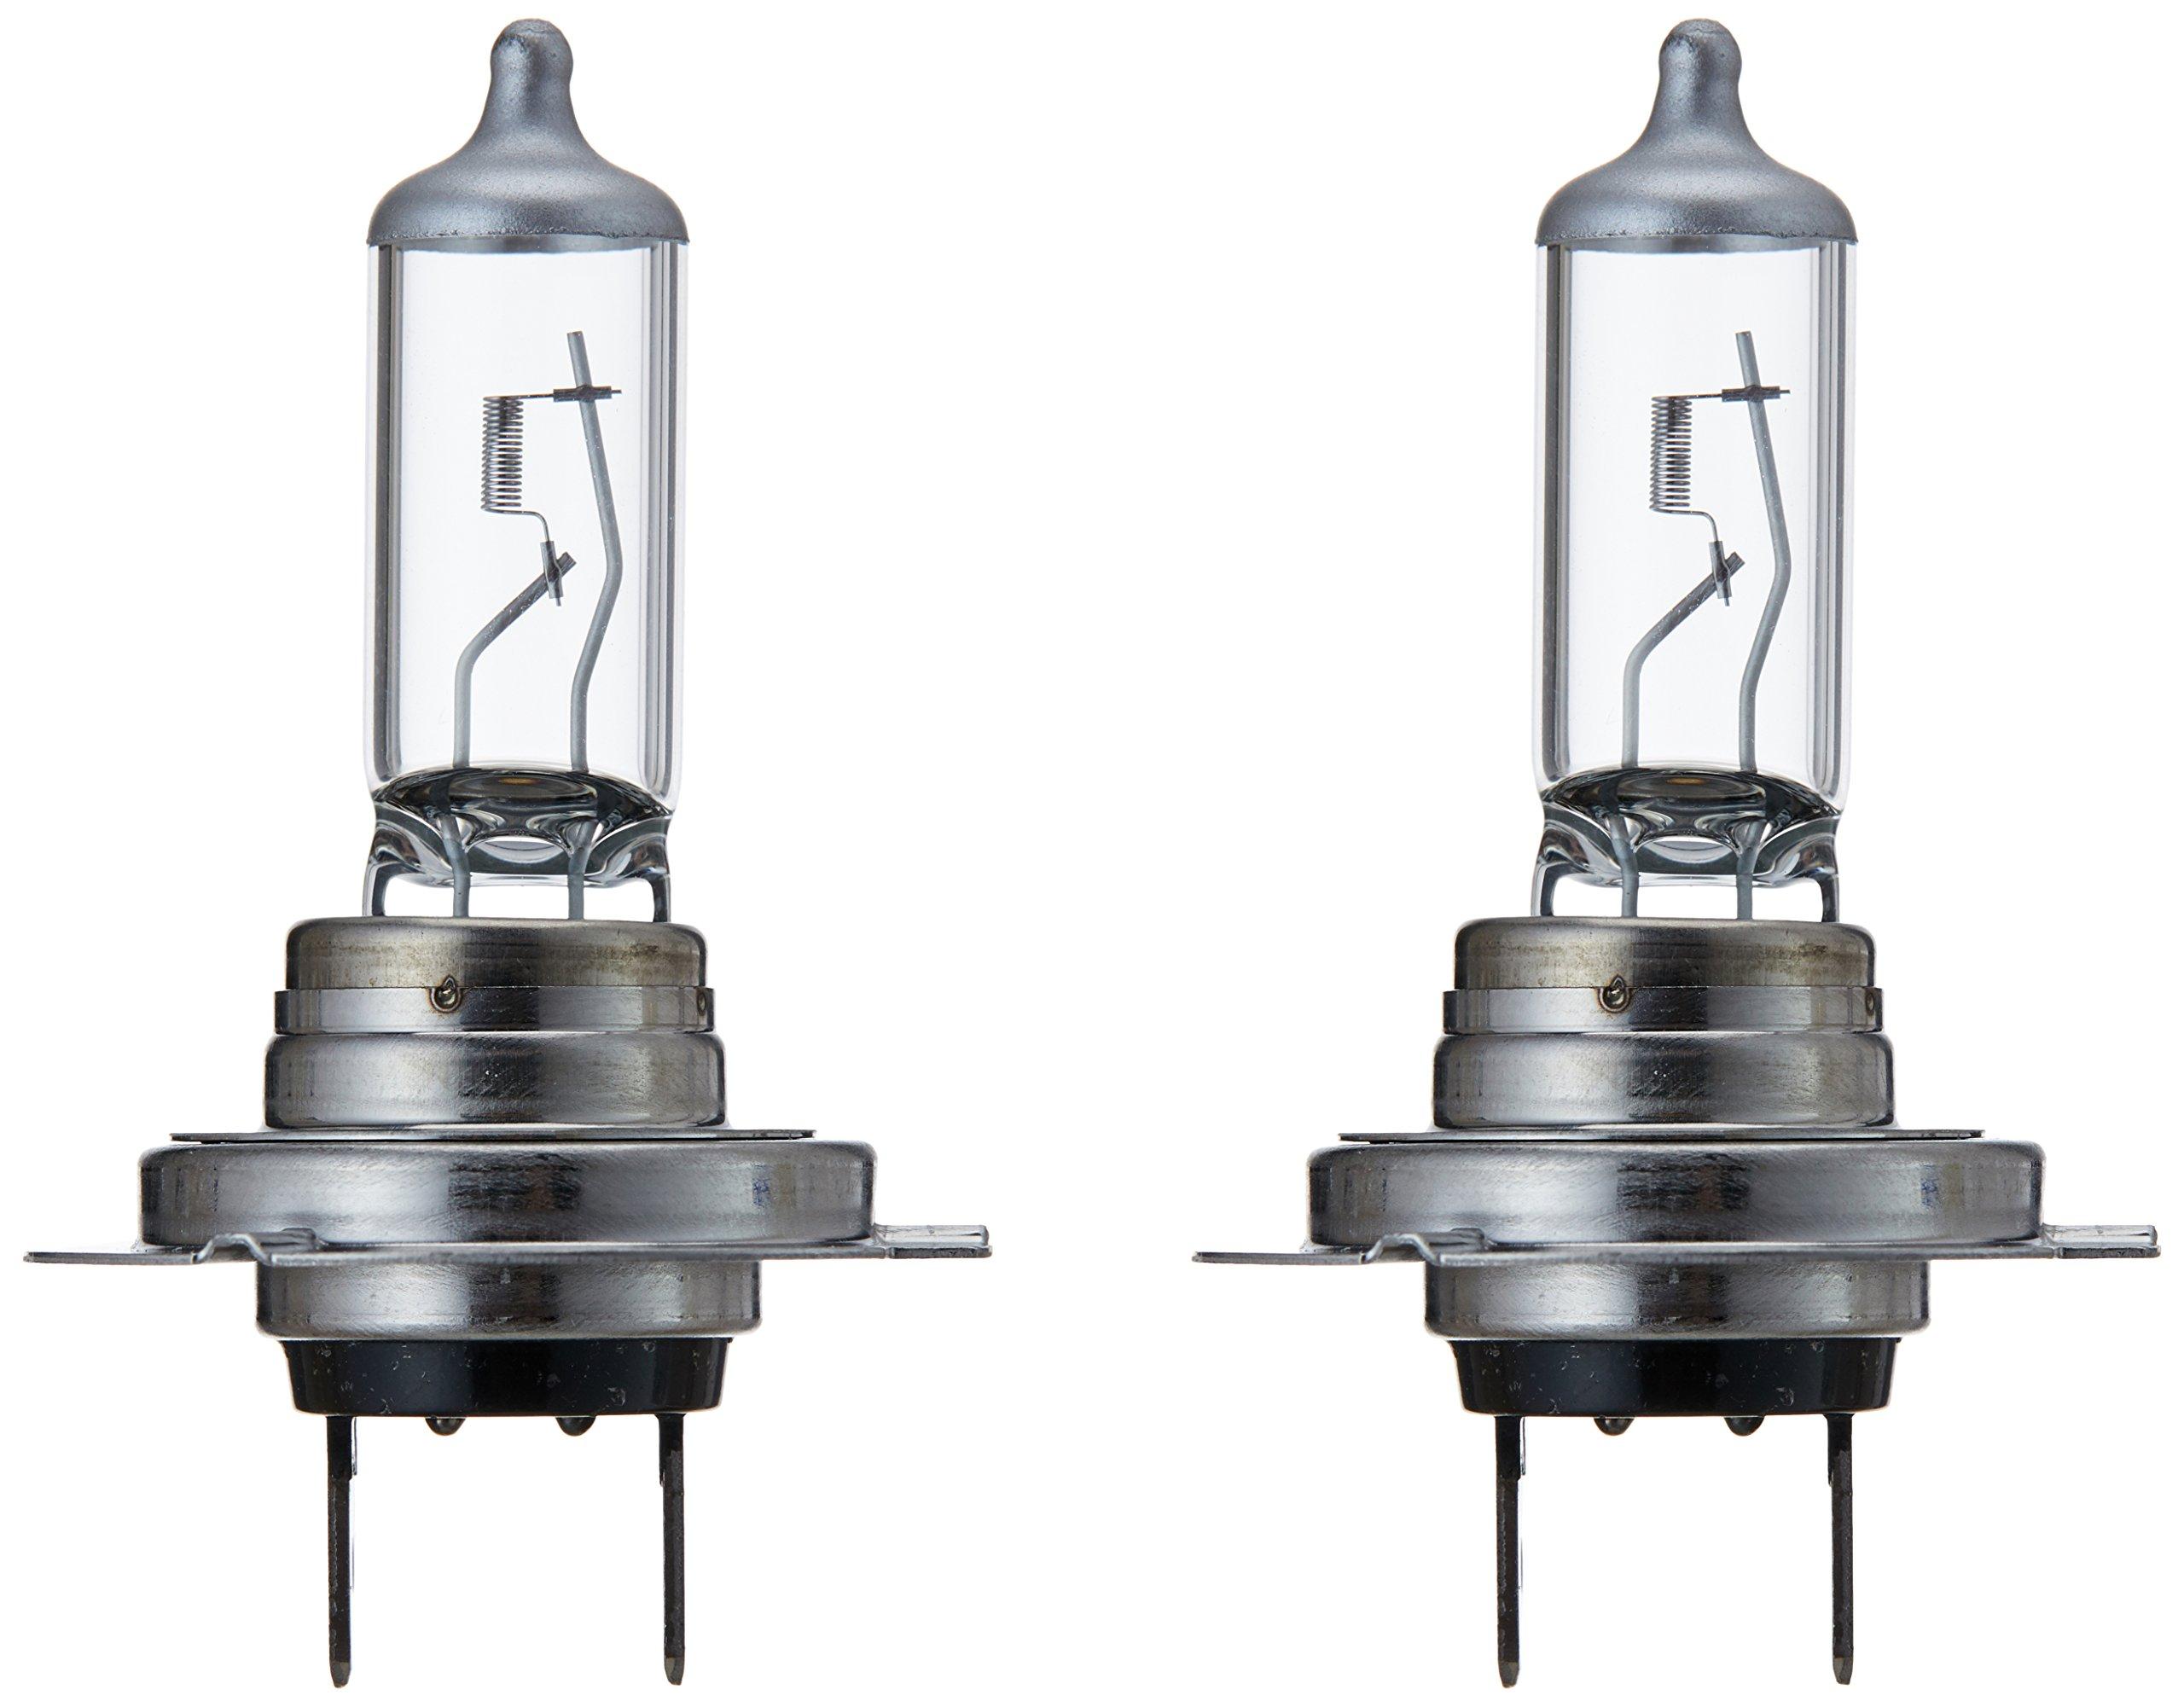 2x Citroen GS Genuine Osram Original Stop Brake Light Bulbs